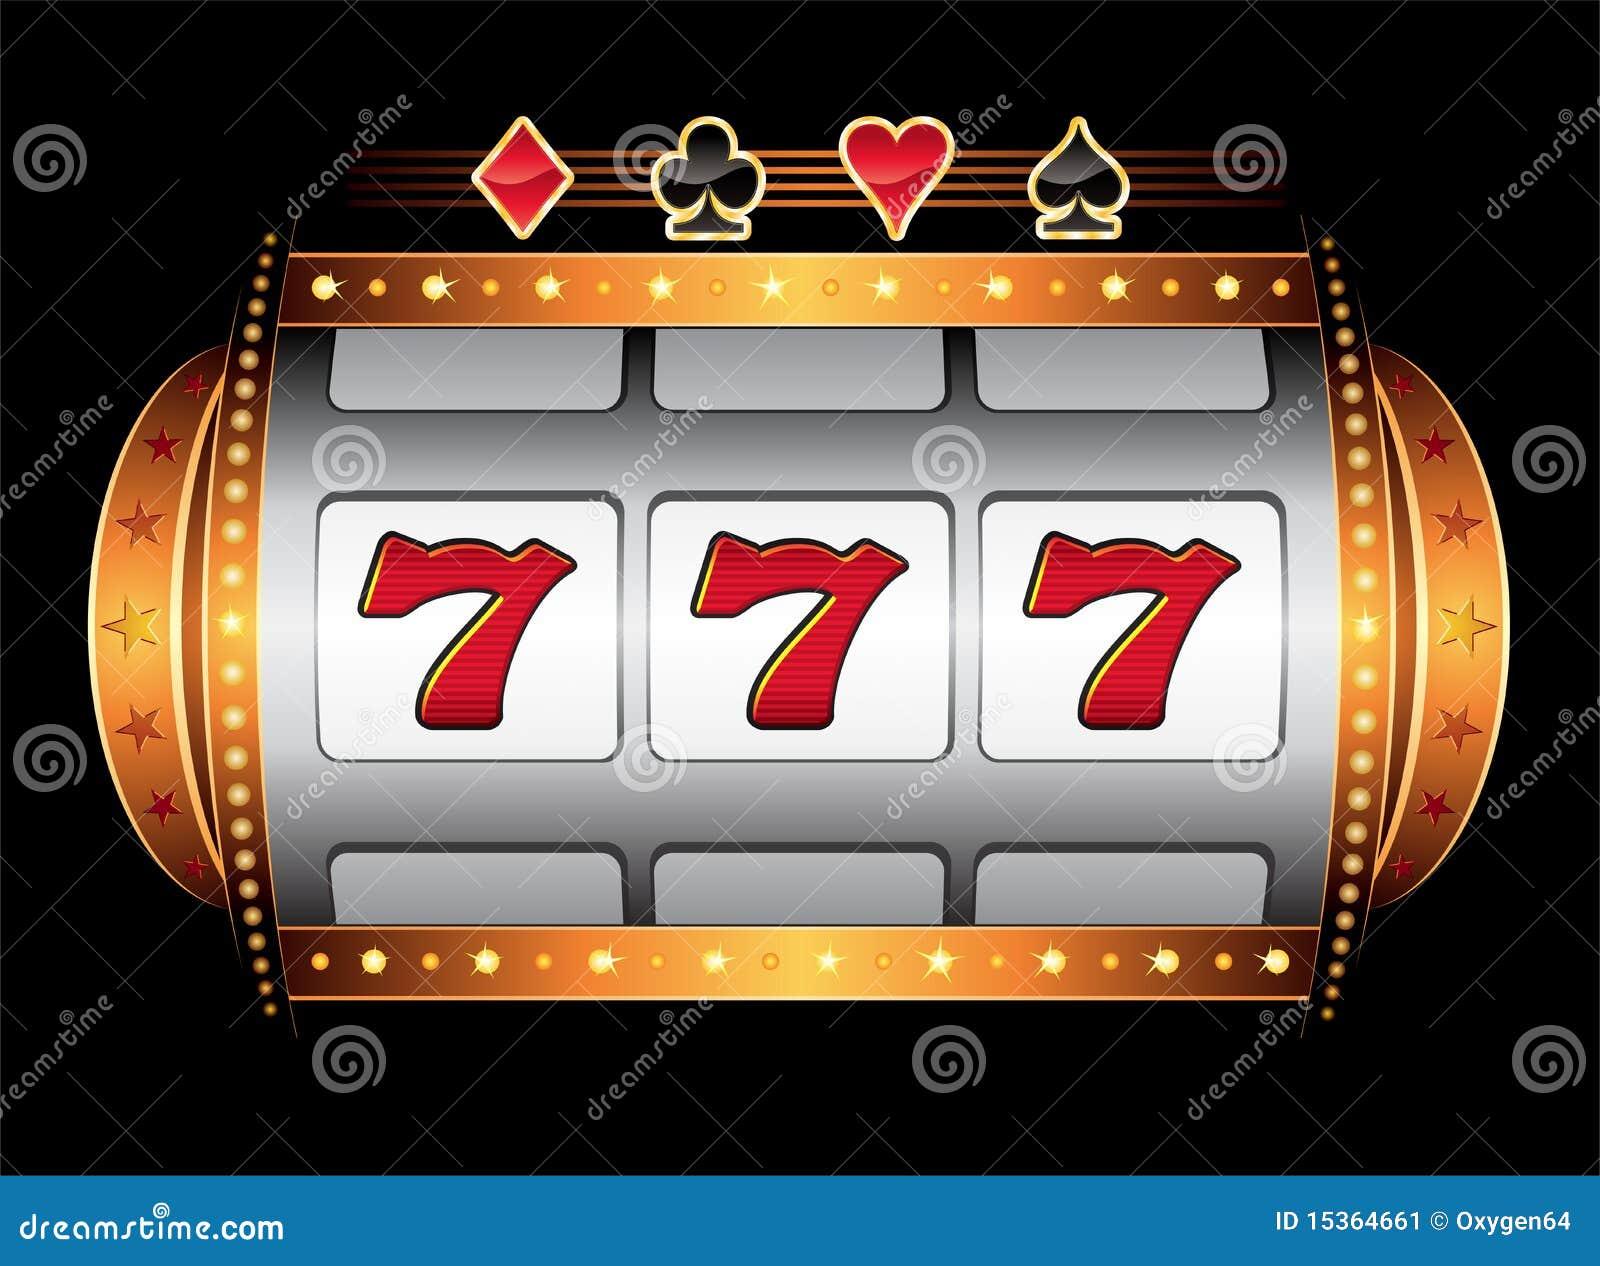 slot machine 777